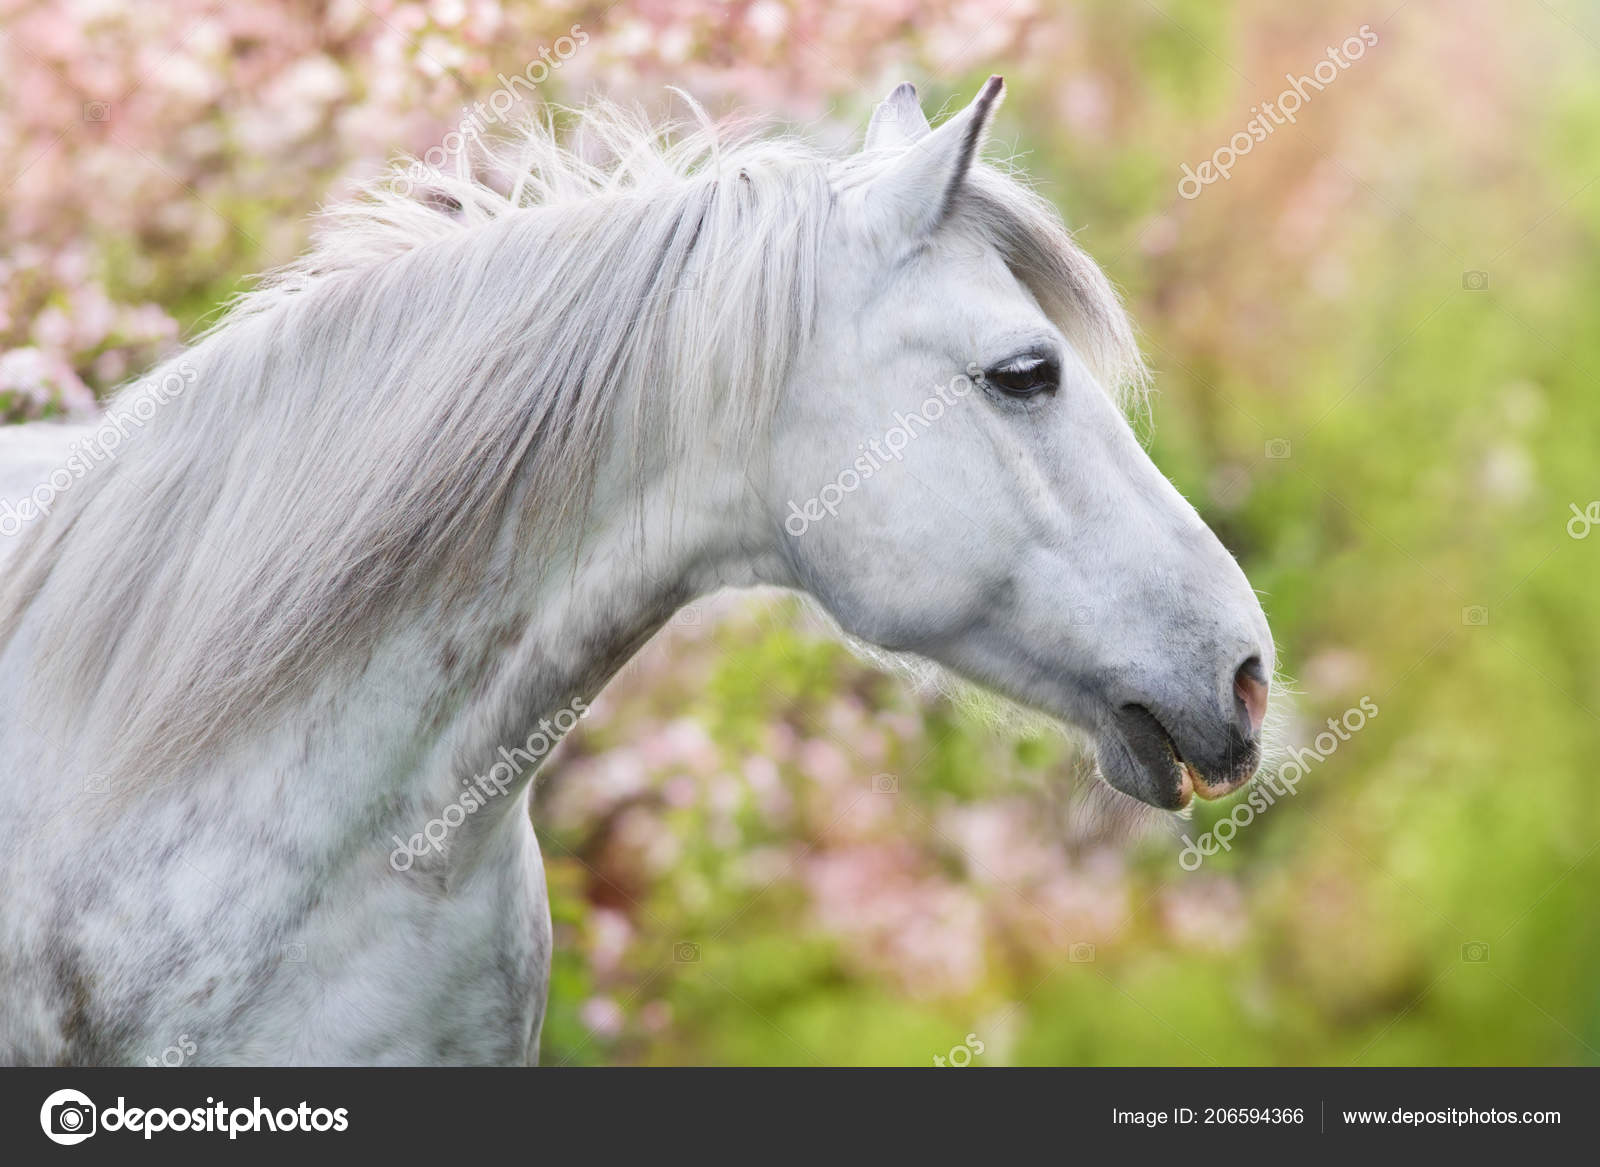 White Horse Portrait Spring Pink Blossom Tree Stock Photo C Kwadrat70 206594366